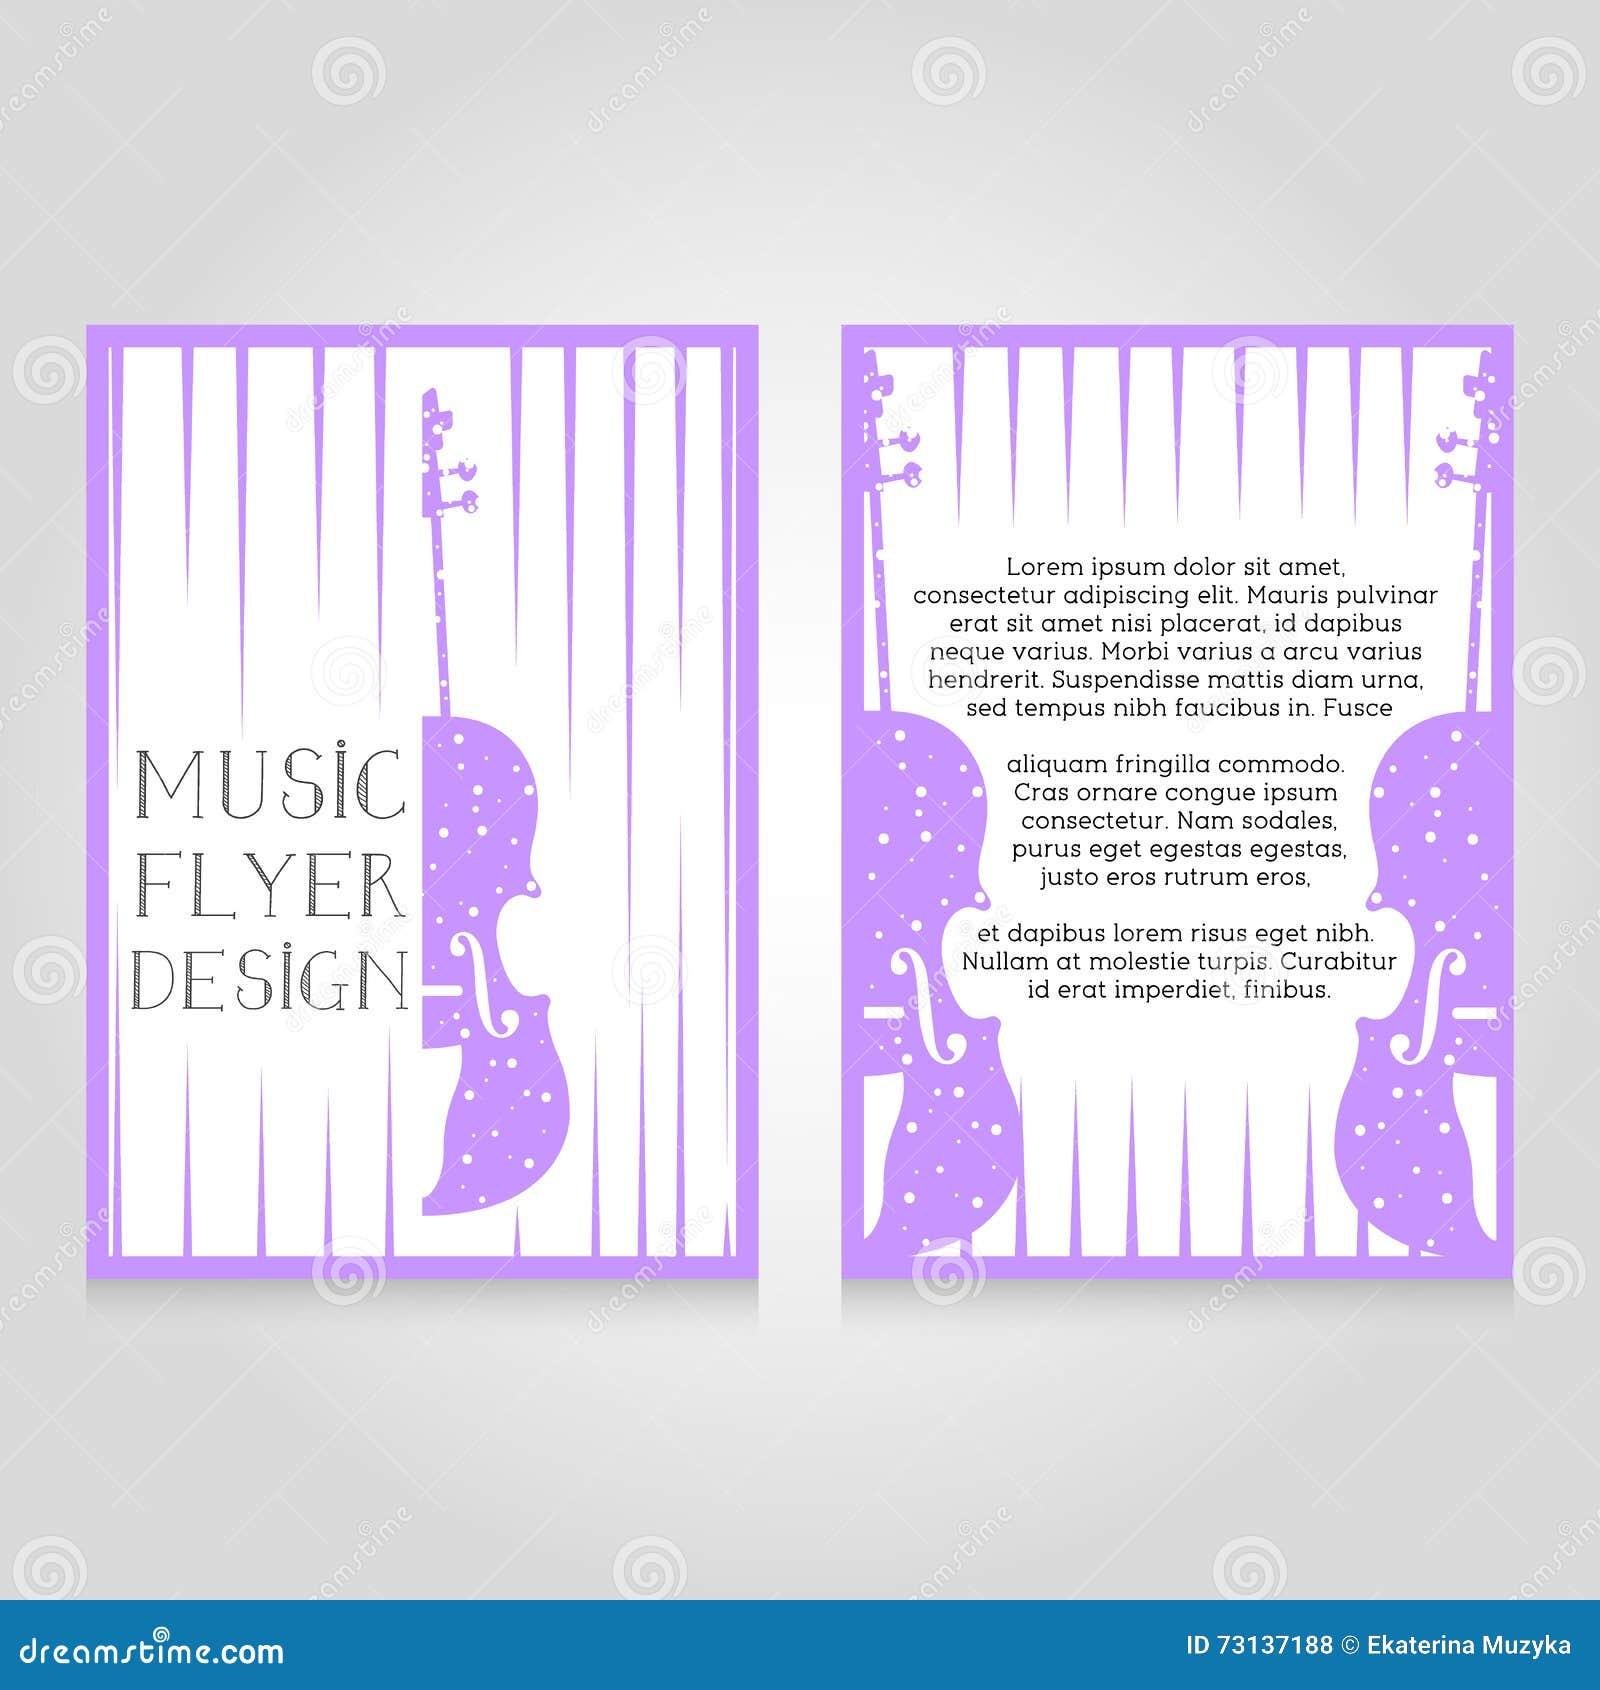 Music festival brochure flier design template. Vector concert poster illustration. Leaflet cover layout in A4 size